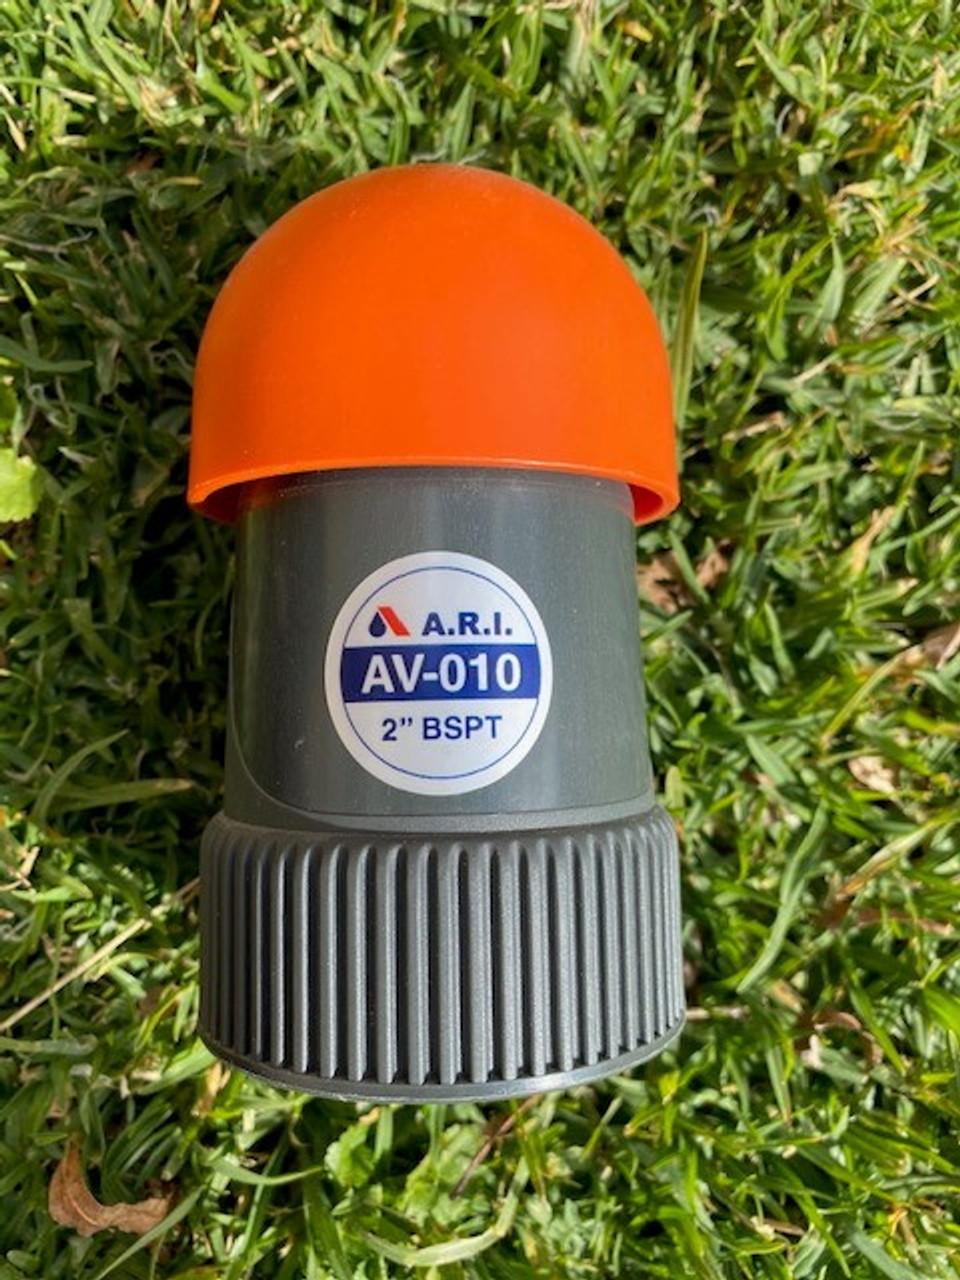 50mm Vacuum Breaker Valve - ARI  AV-010-50